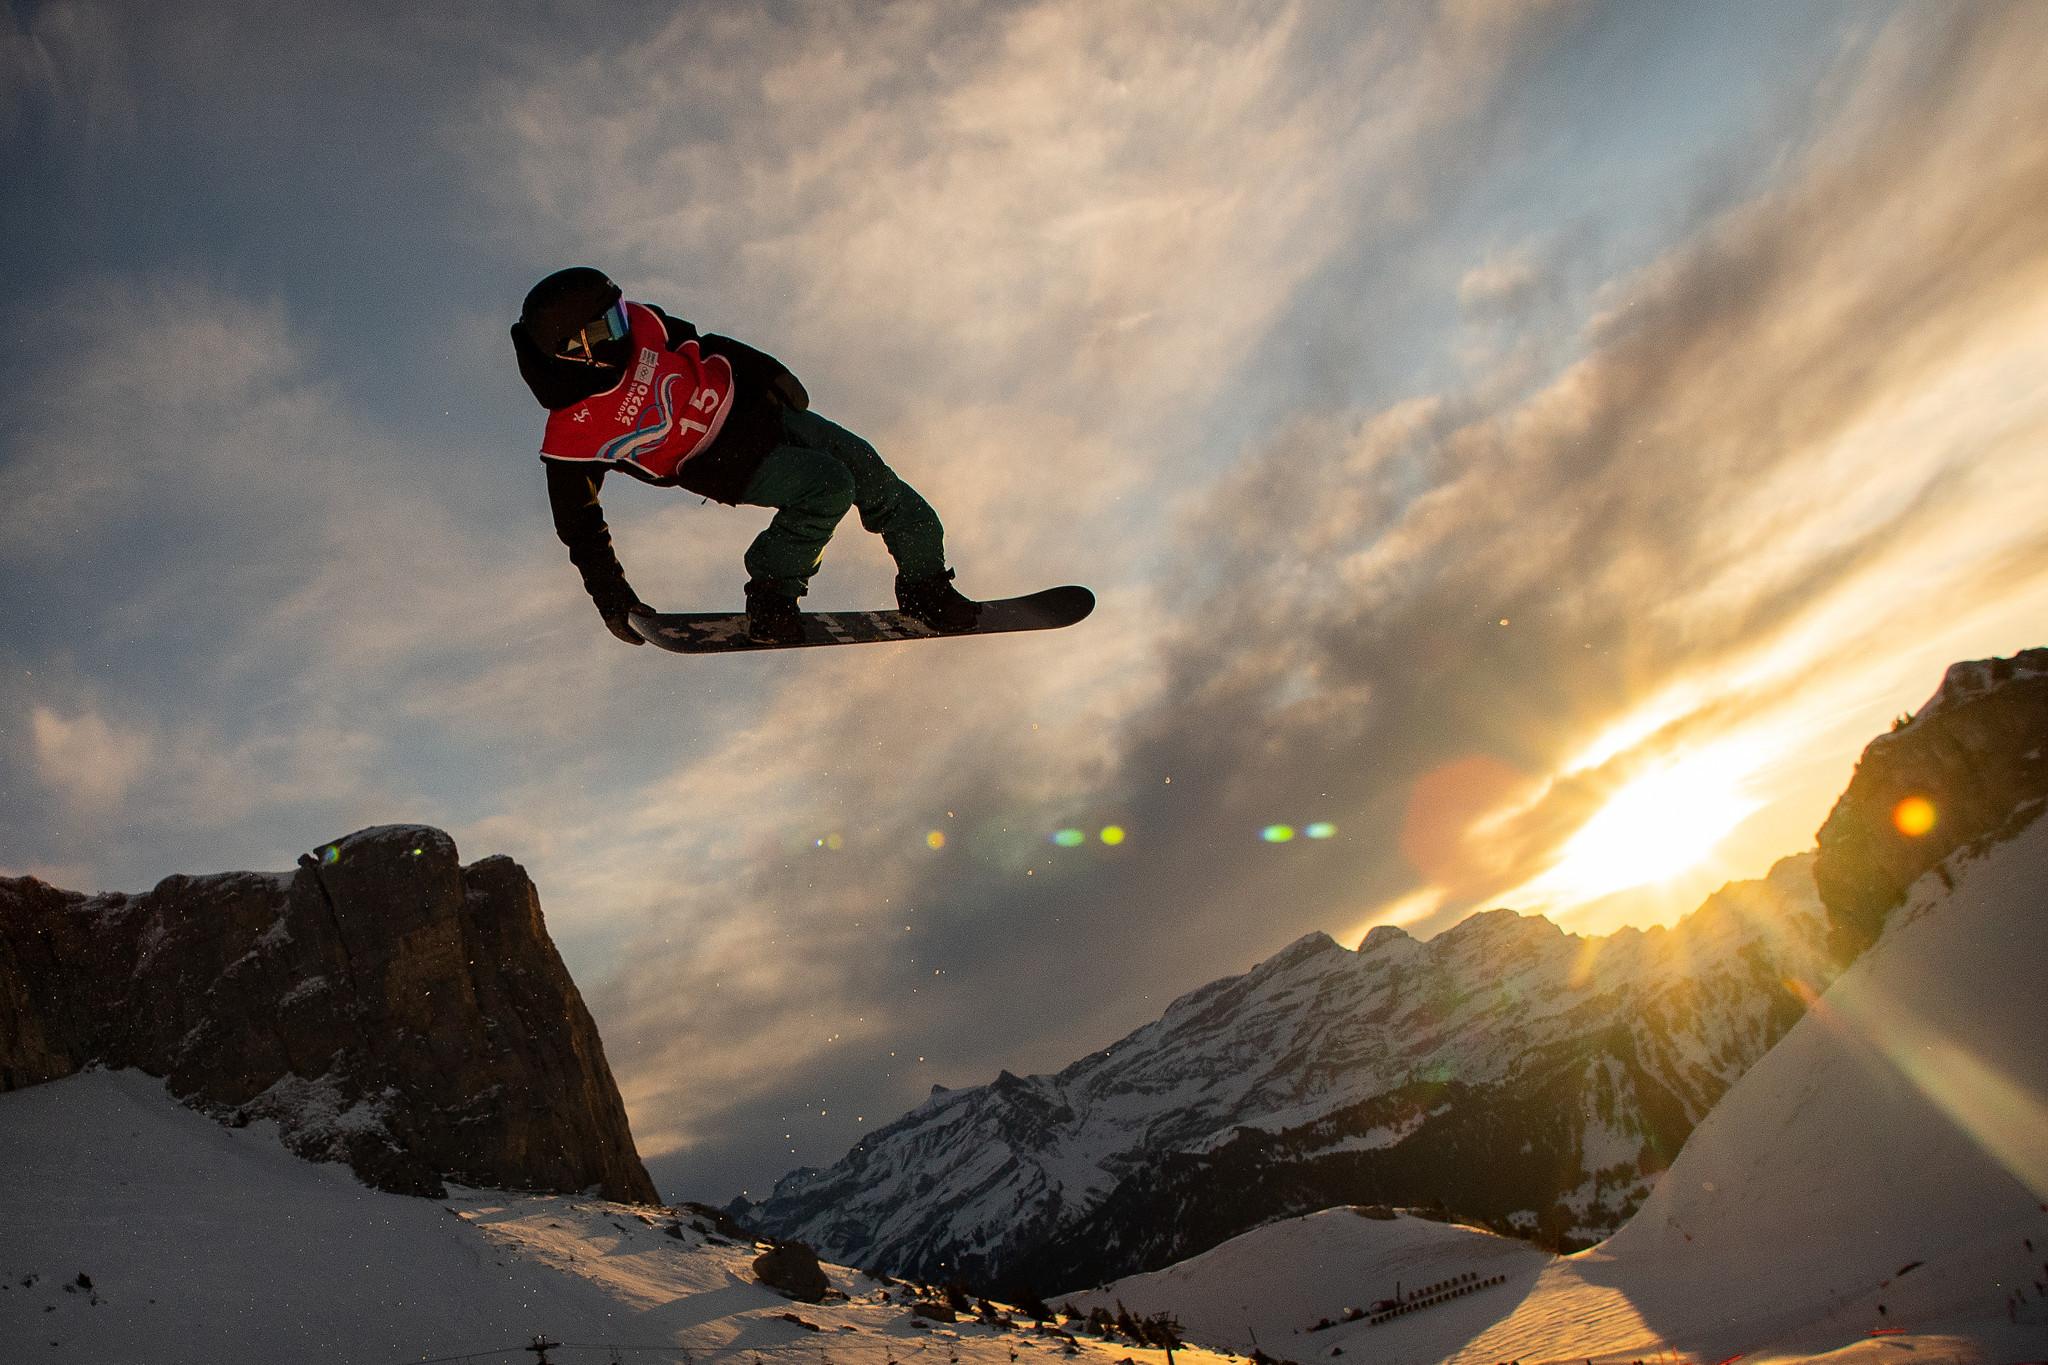 Ruka Hirano won the men's snowboard halfpipe event ©Getty Images